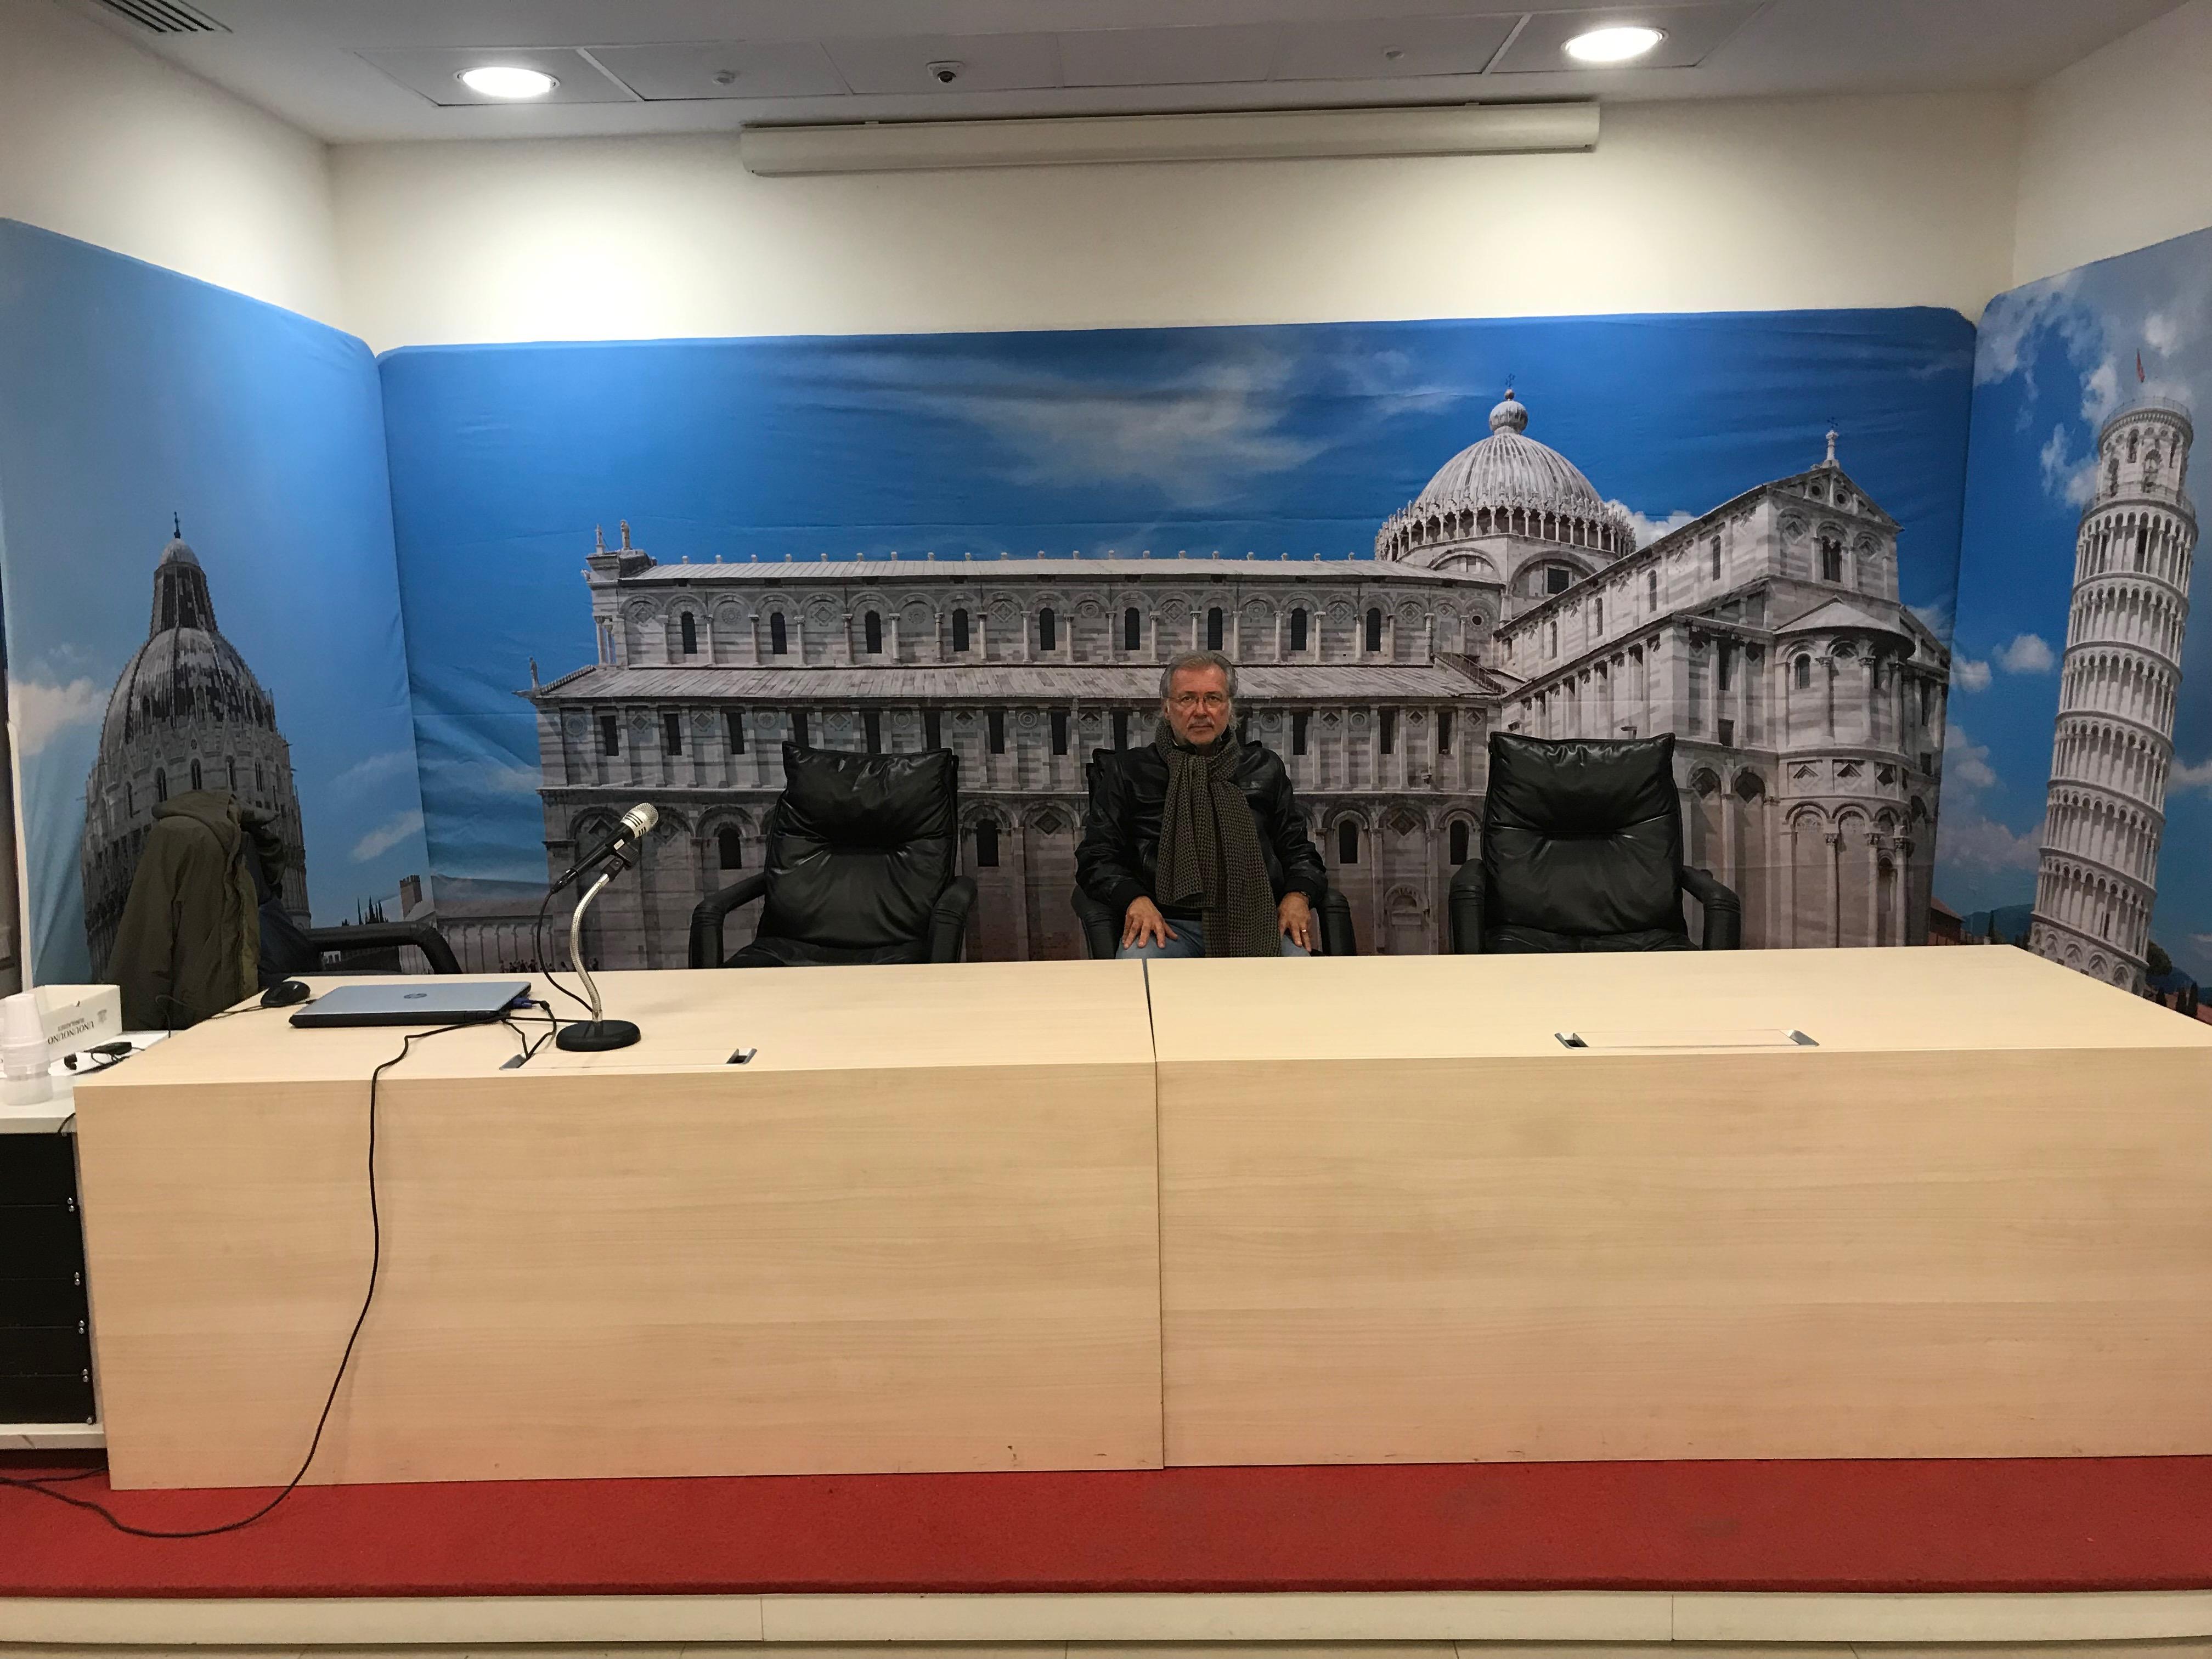 fondali, trompe l'oeil, pannelli decorativi, finte pareti, stampa su pvc, stampa su d-bond Pisa lucca Livorno